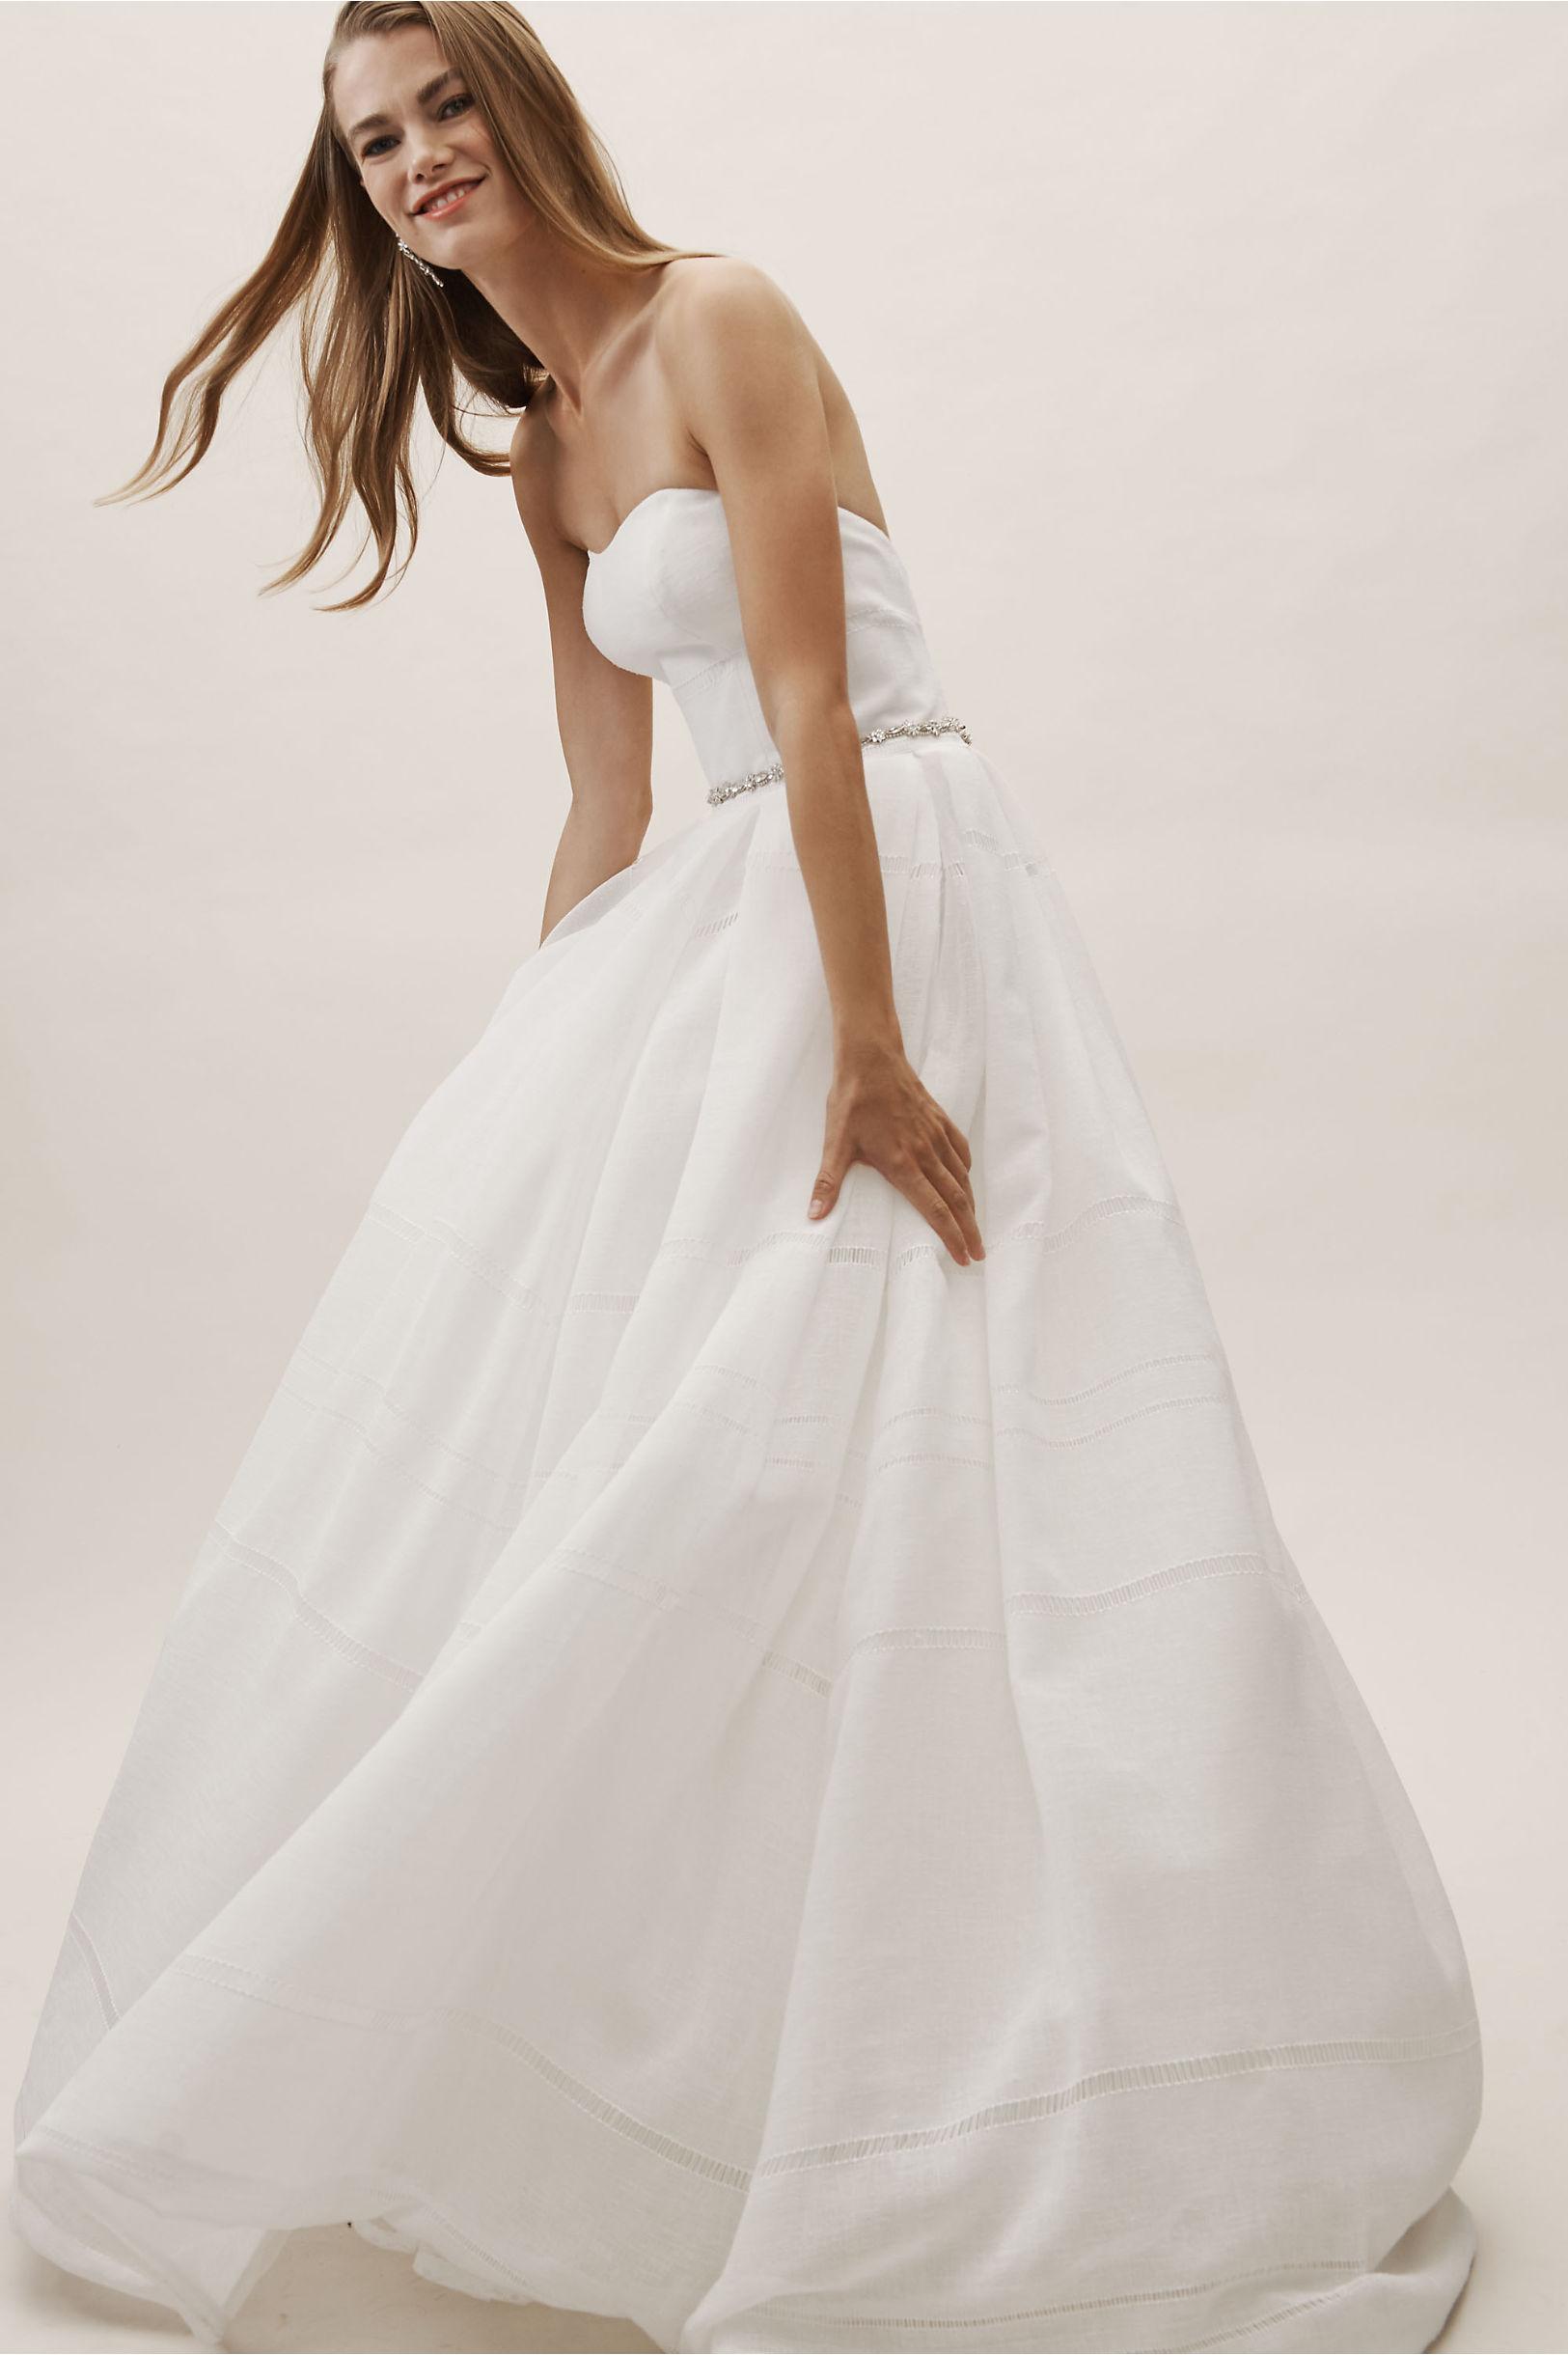 to wear - Linen white wedding dress video